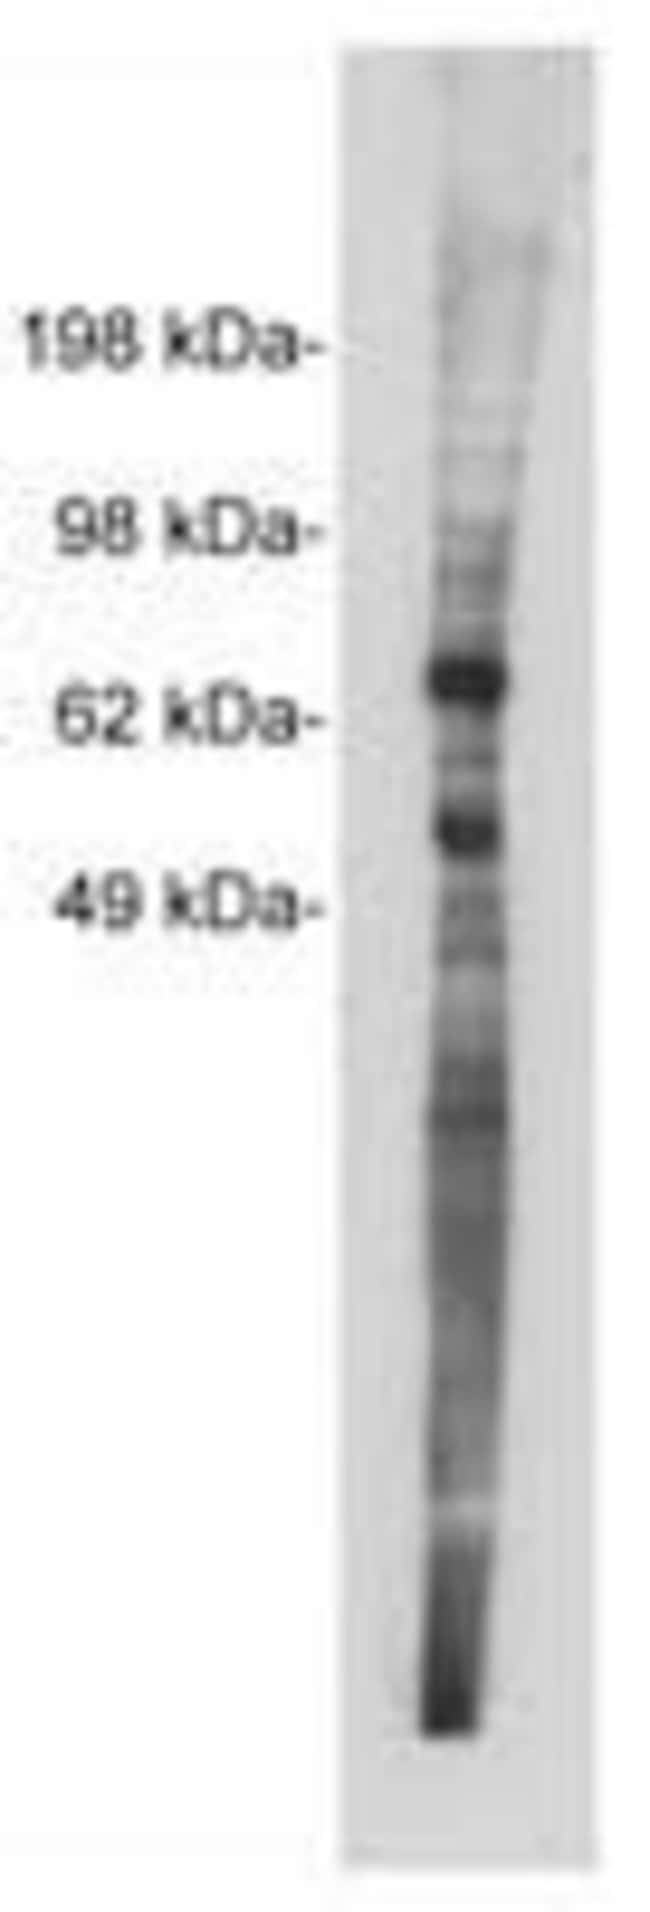 NTN1 Rabbit anti-Bovine, Feline, Human, Mouse, Non-human primate, Rat, Polyclonal, Invitrogen™